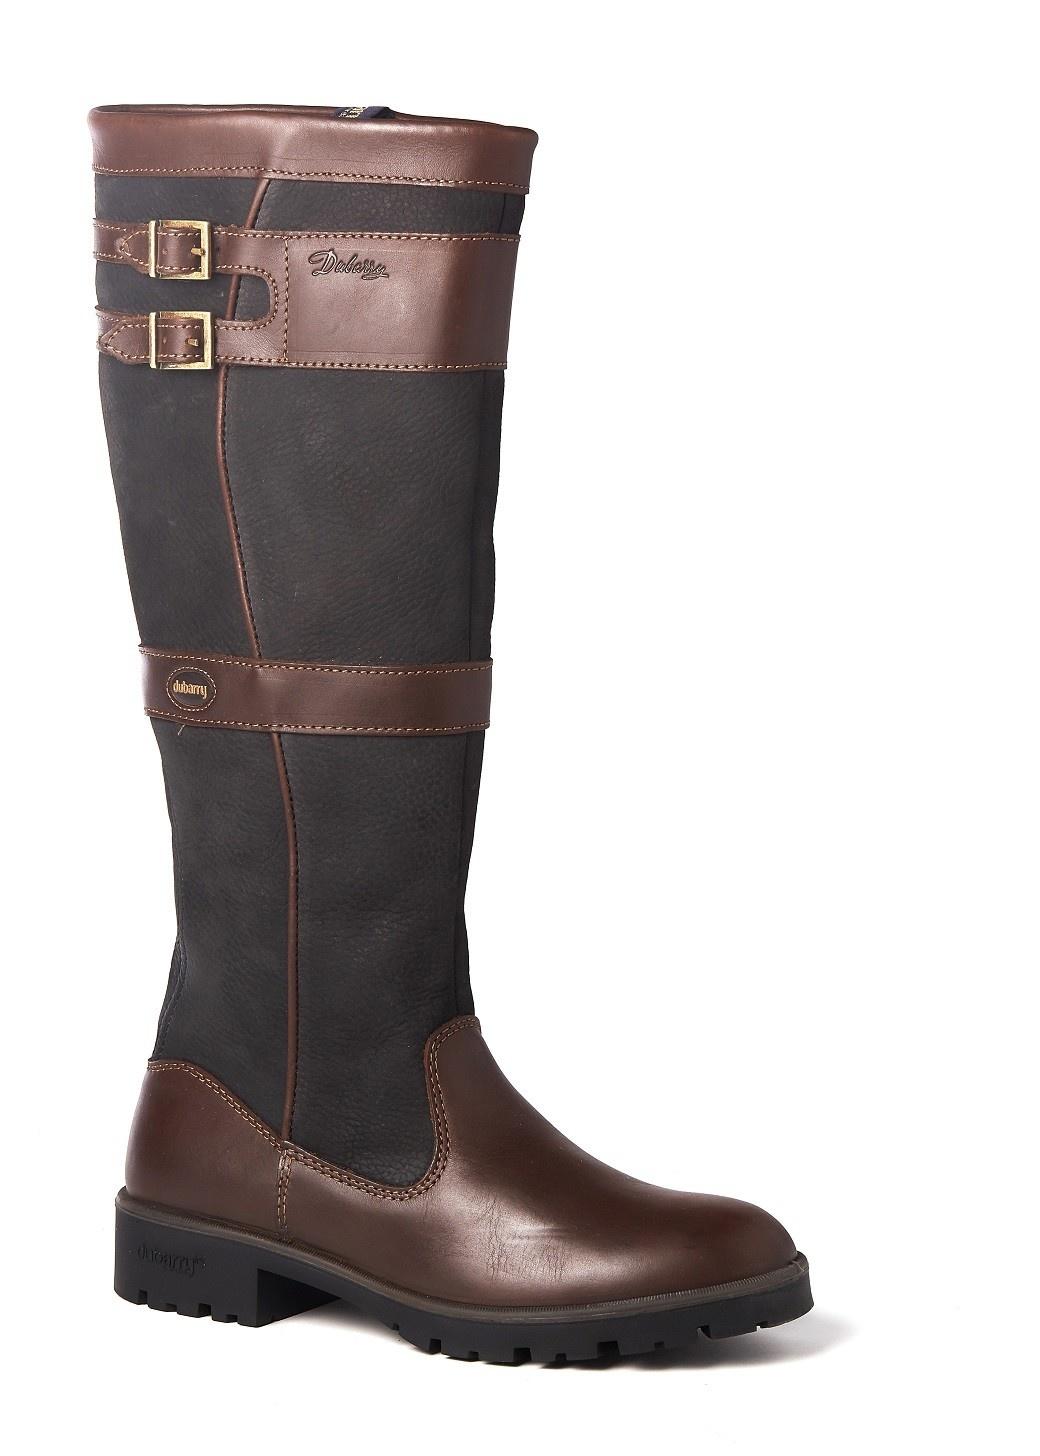 Dubarry Longford - Black/Brown-2